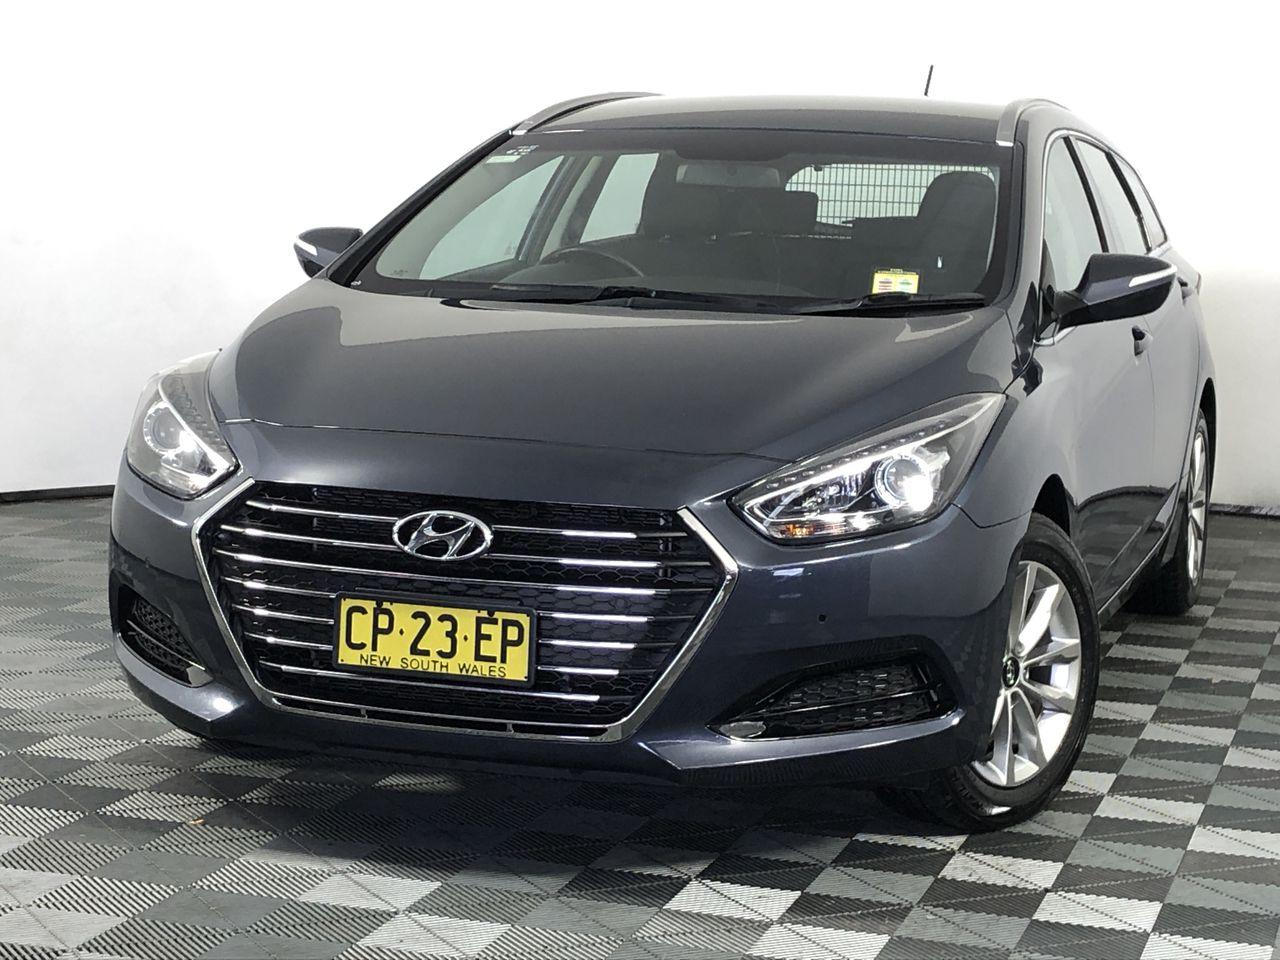 2018 Hyundai I40 Automatic Sedan